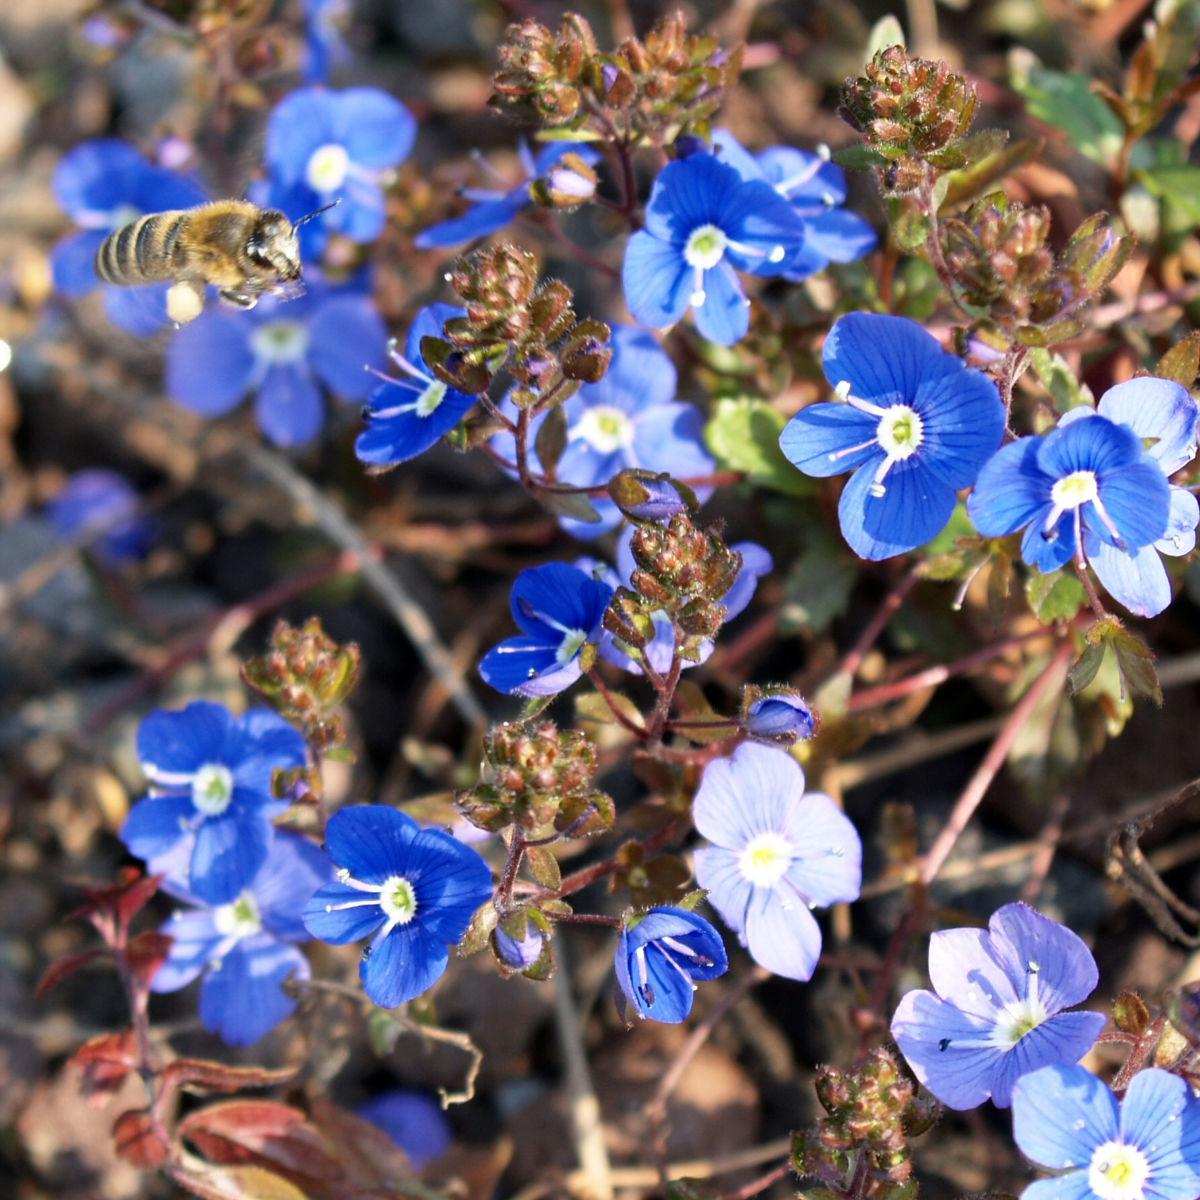 Persischer Ehrenpreis Bluete blau Veronica persica